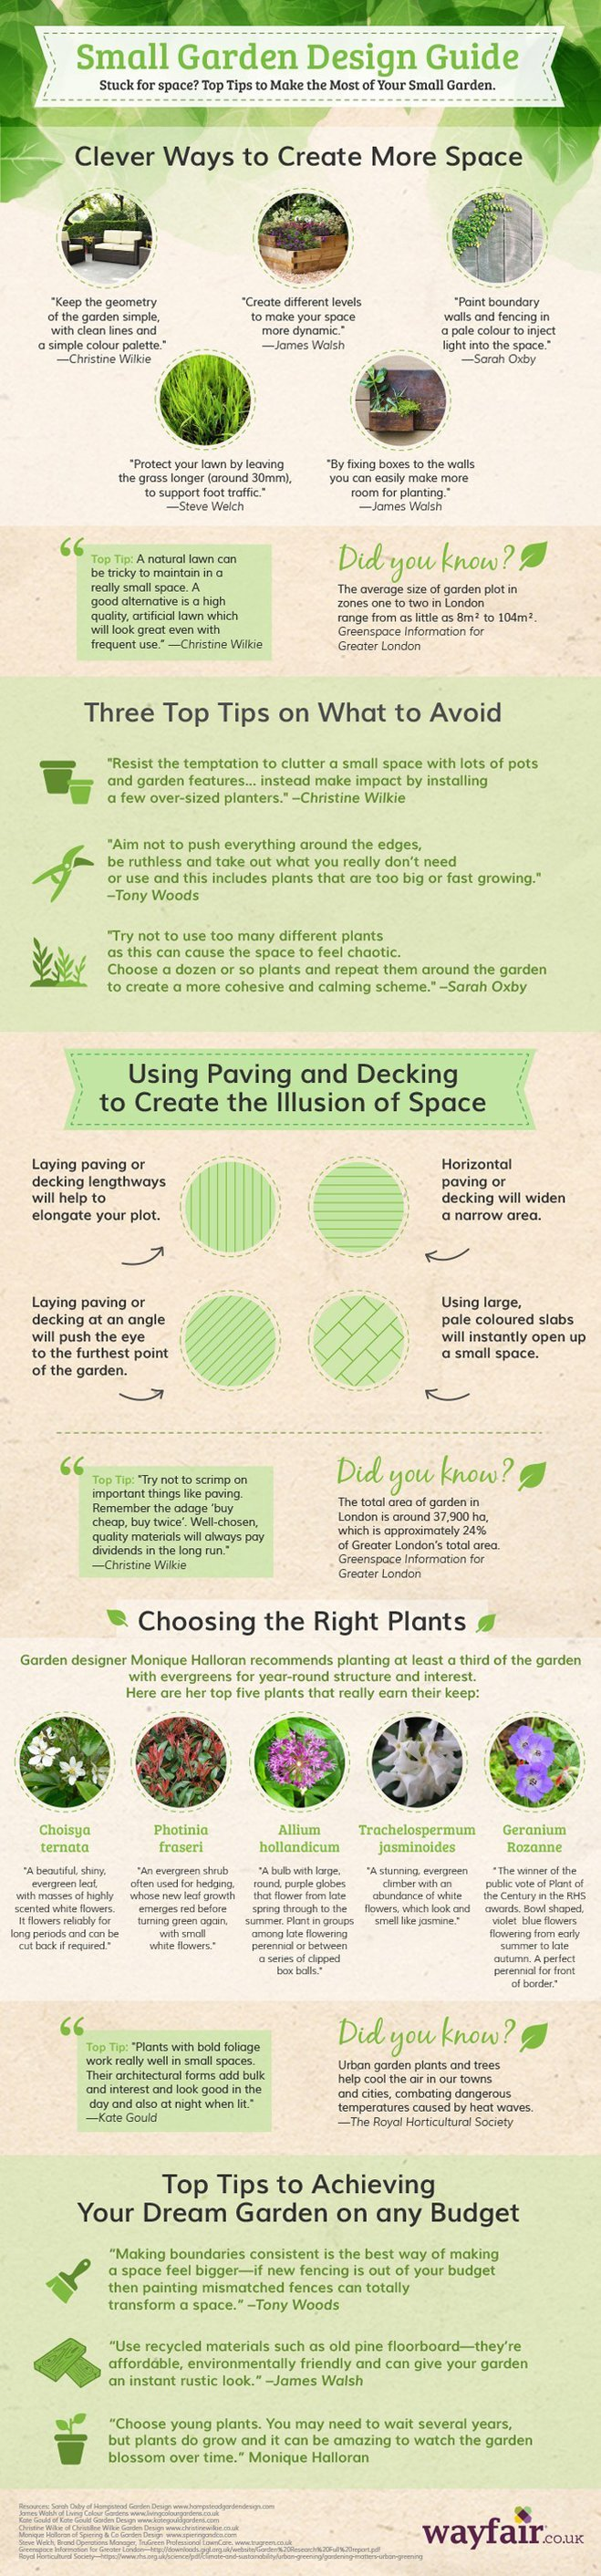 small garden design infographic